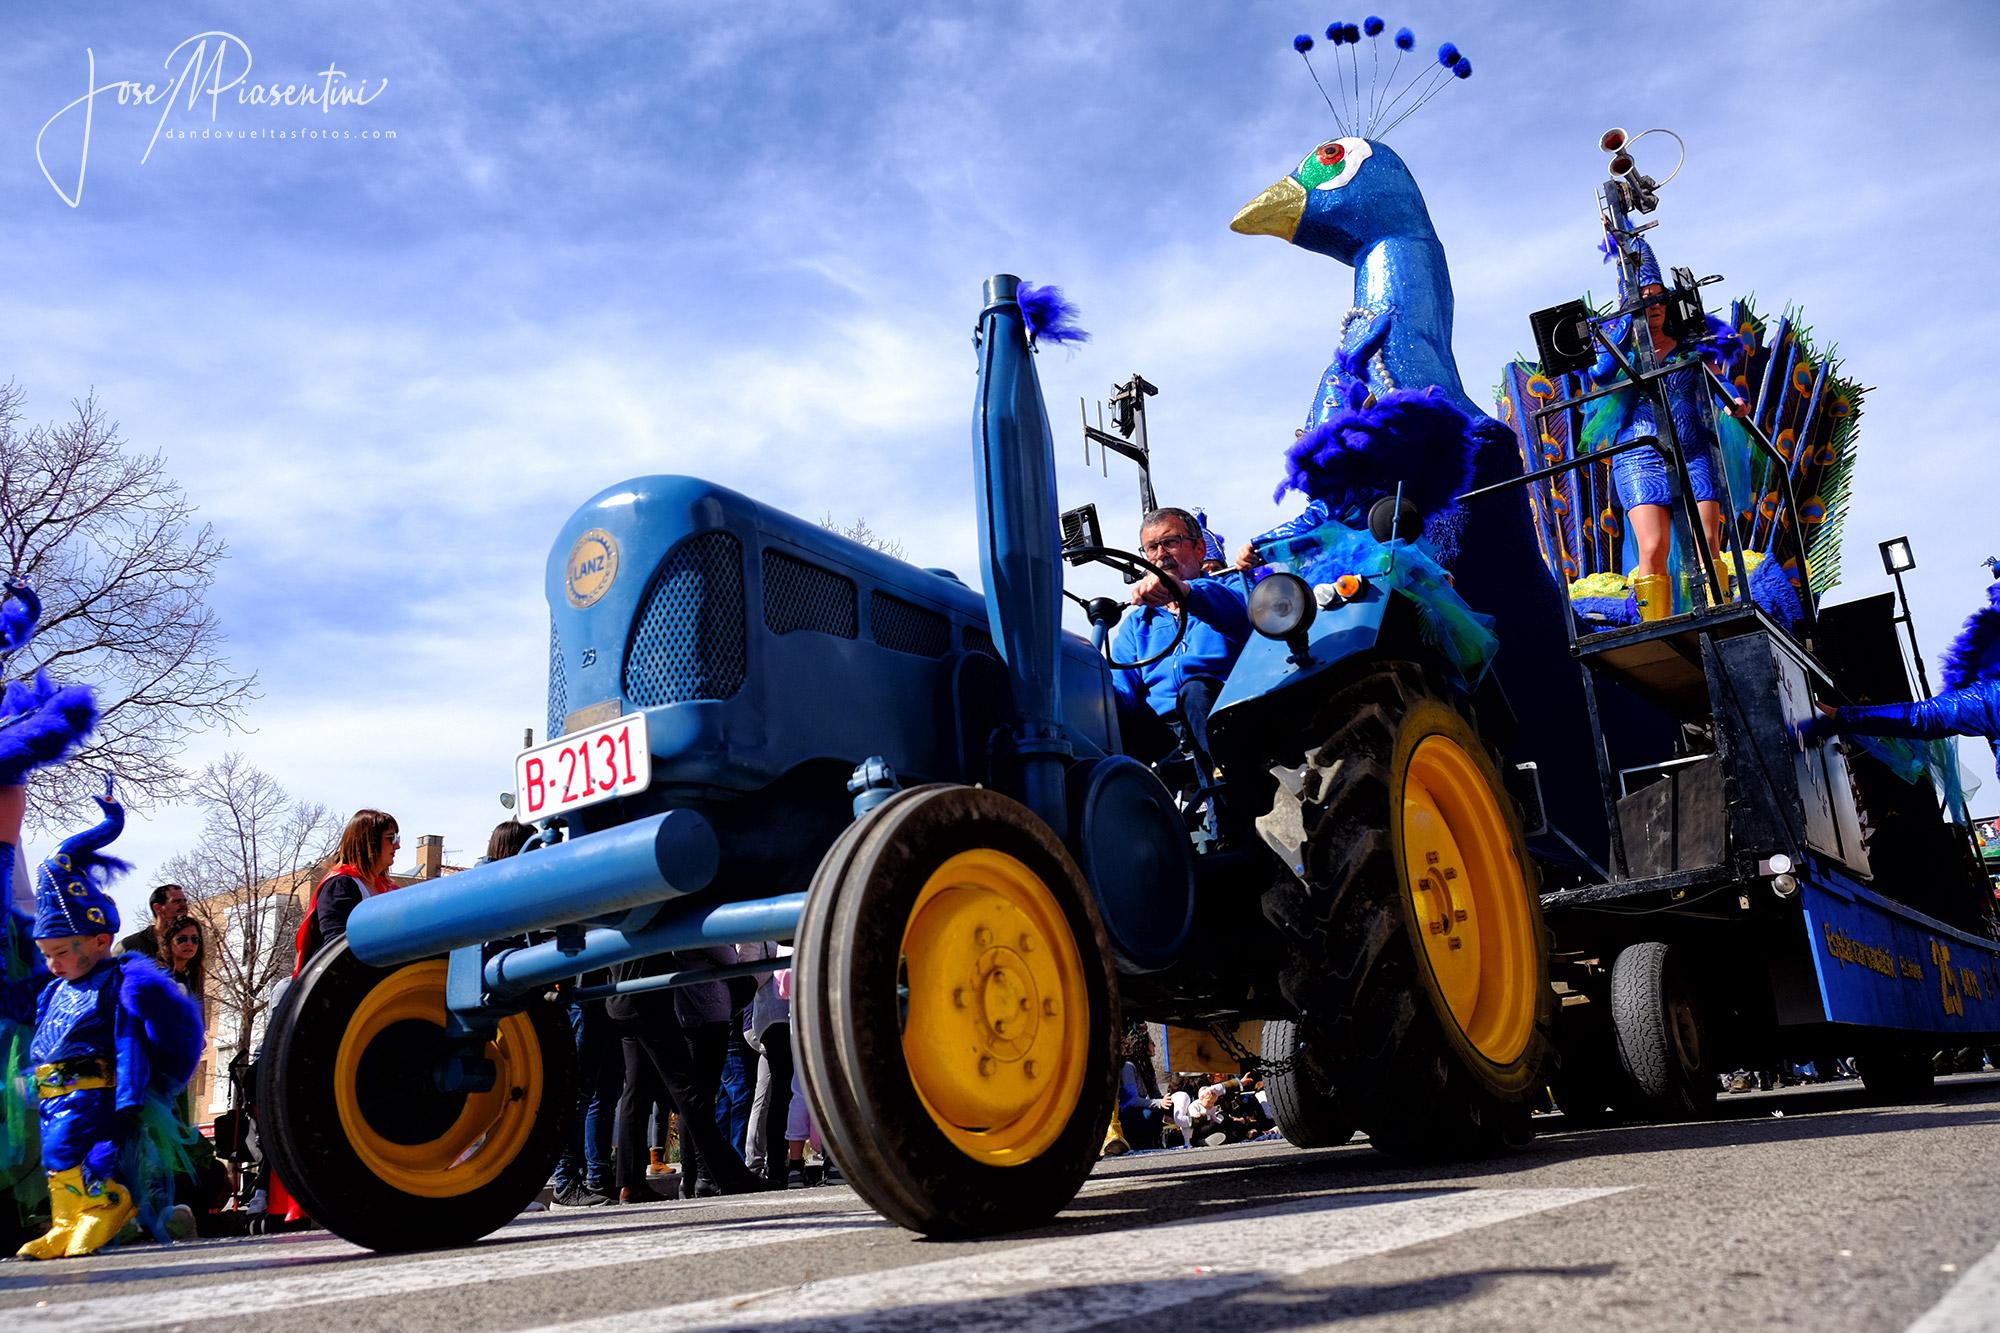 Carrozas carnaval Els Monjos